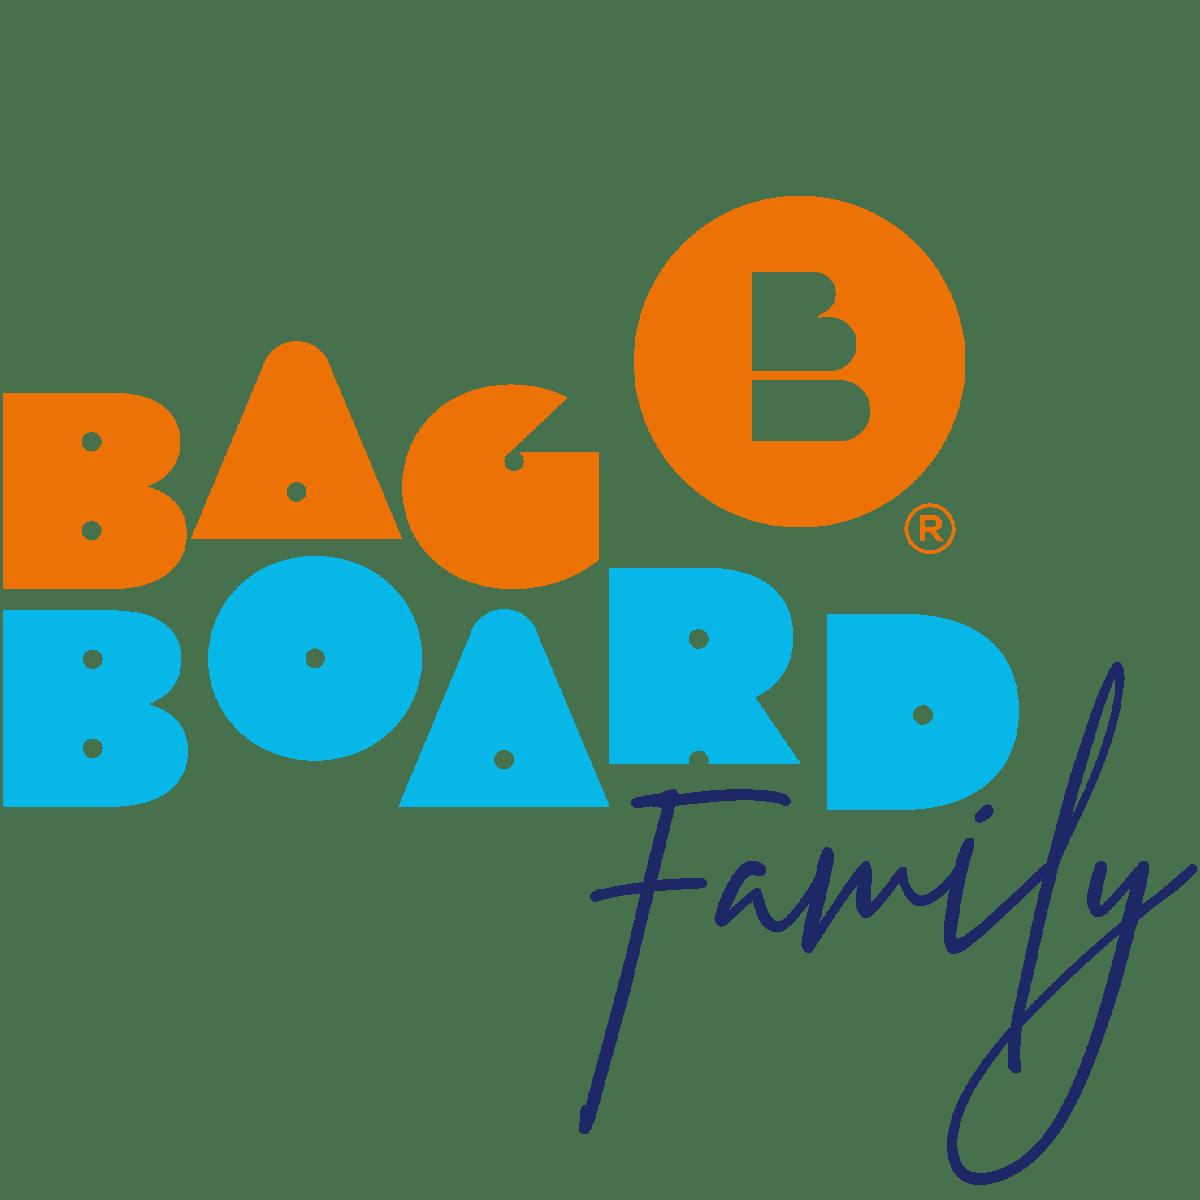 logo bagboard jeu bois family